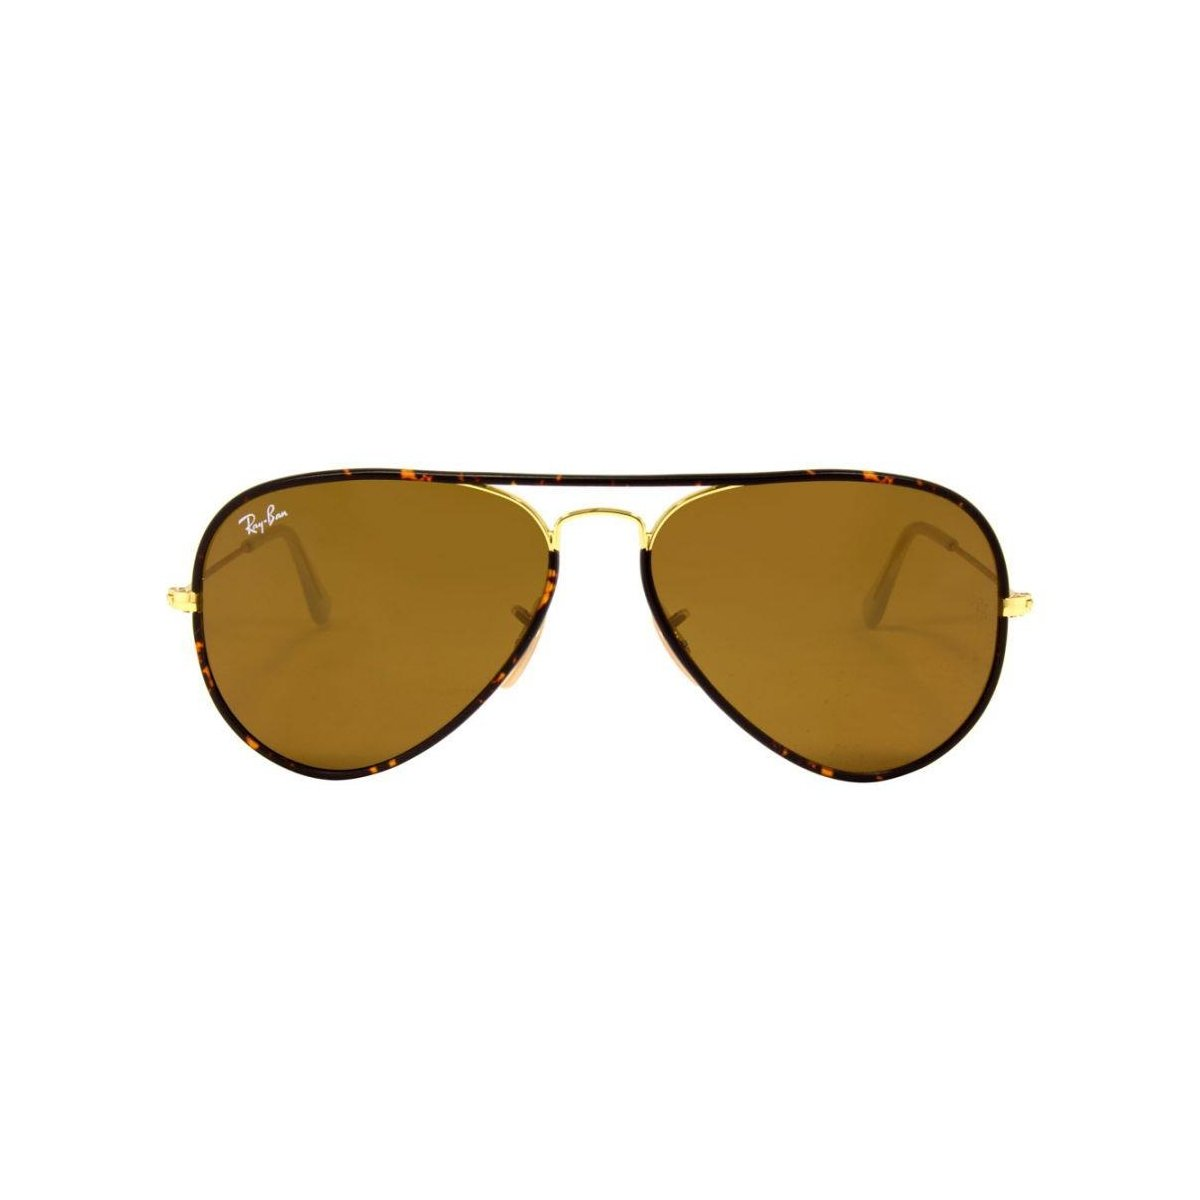 8656922853275 Óculos de Sol Ray Ban Aviator Full Color - Compre Agora